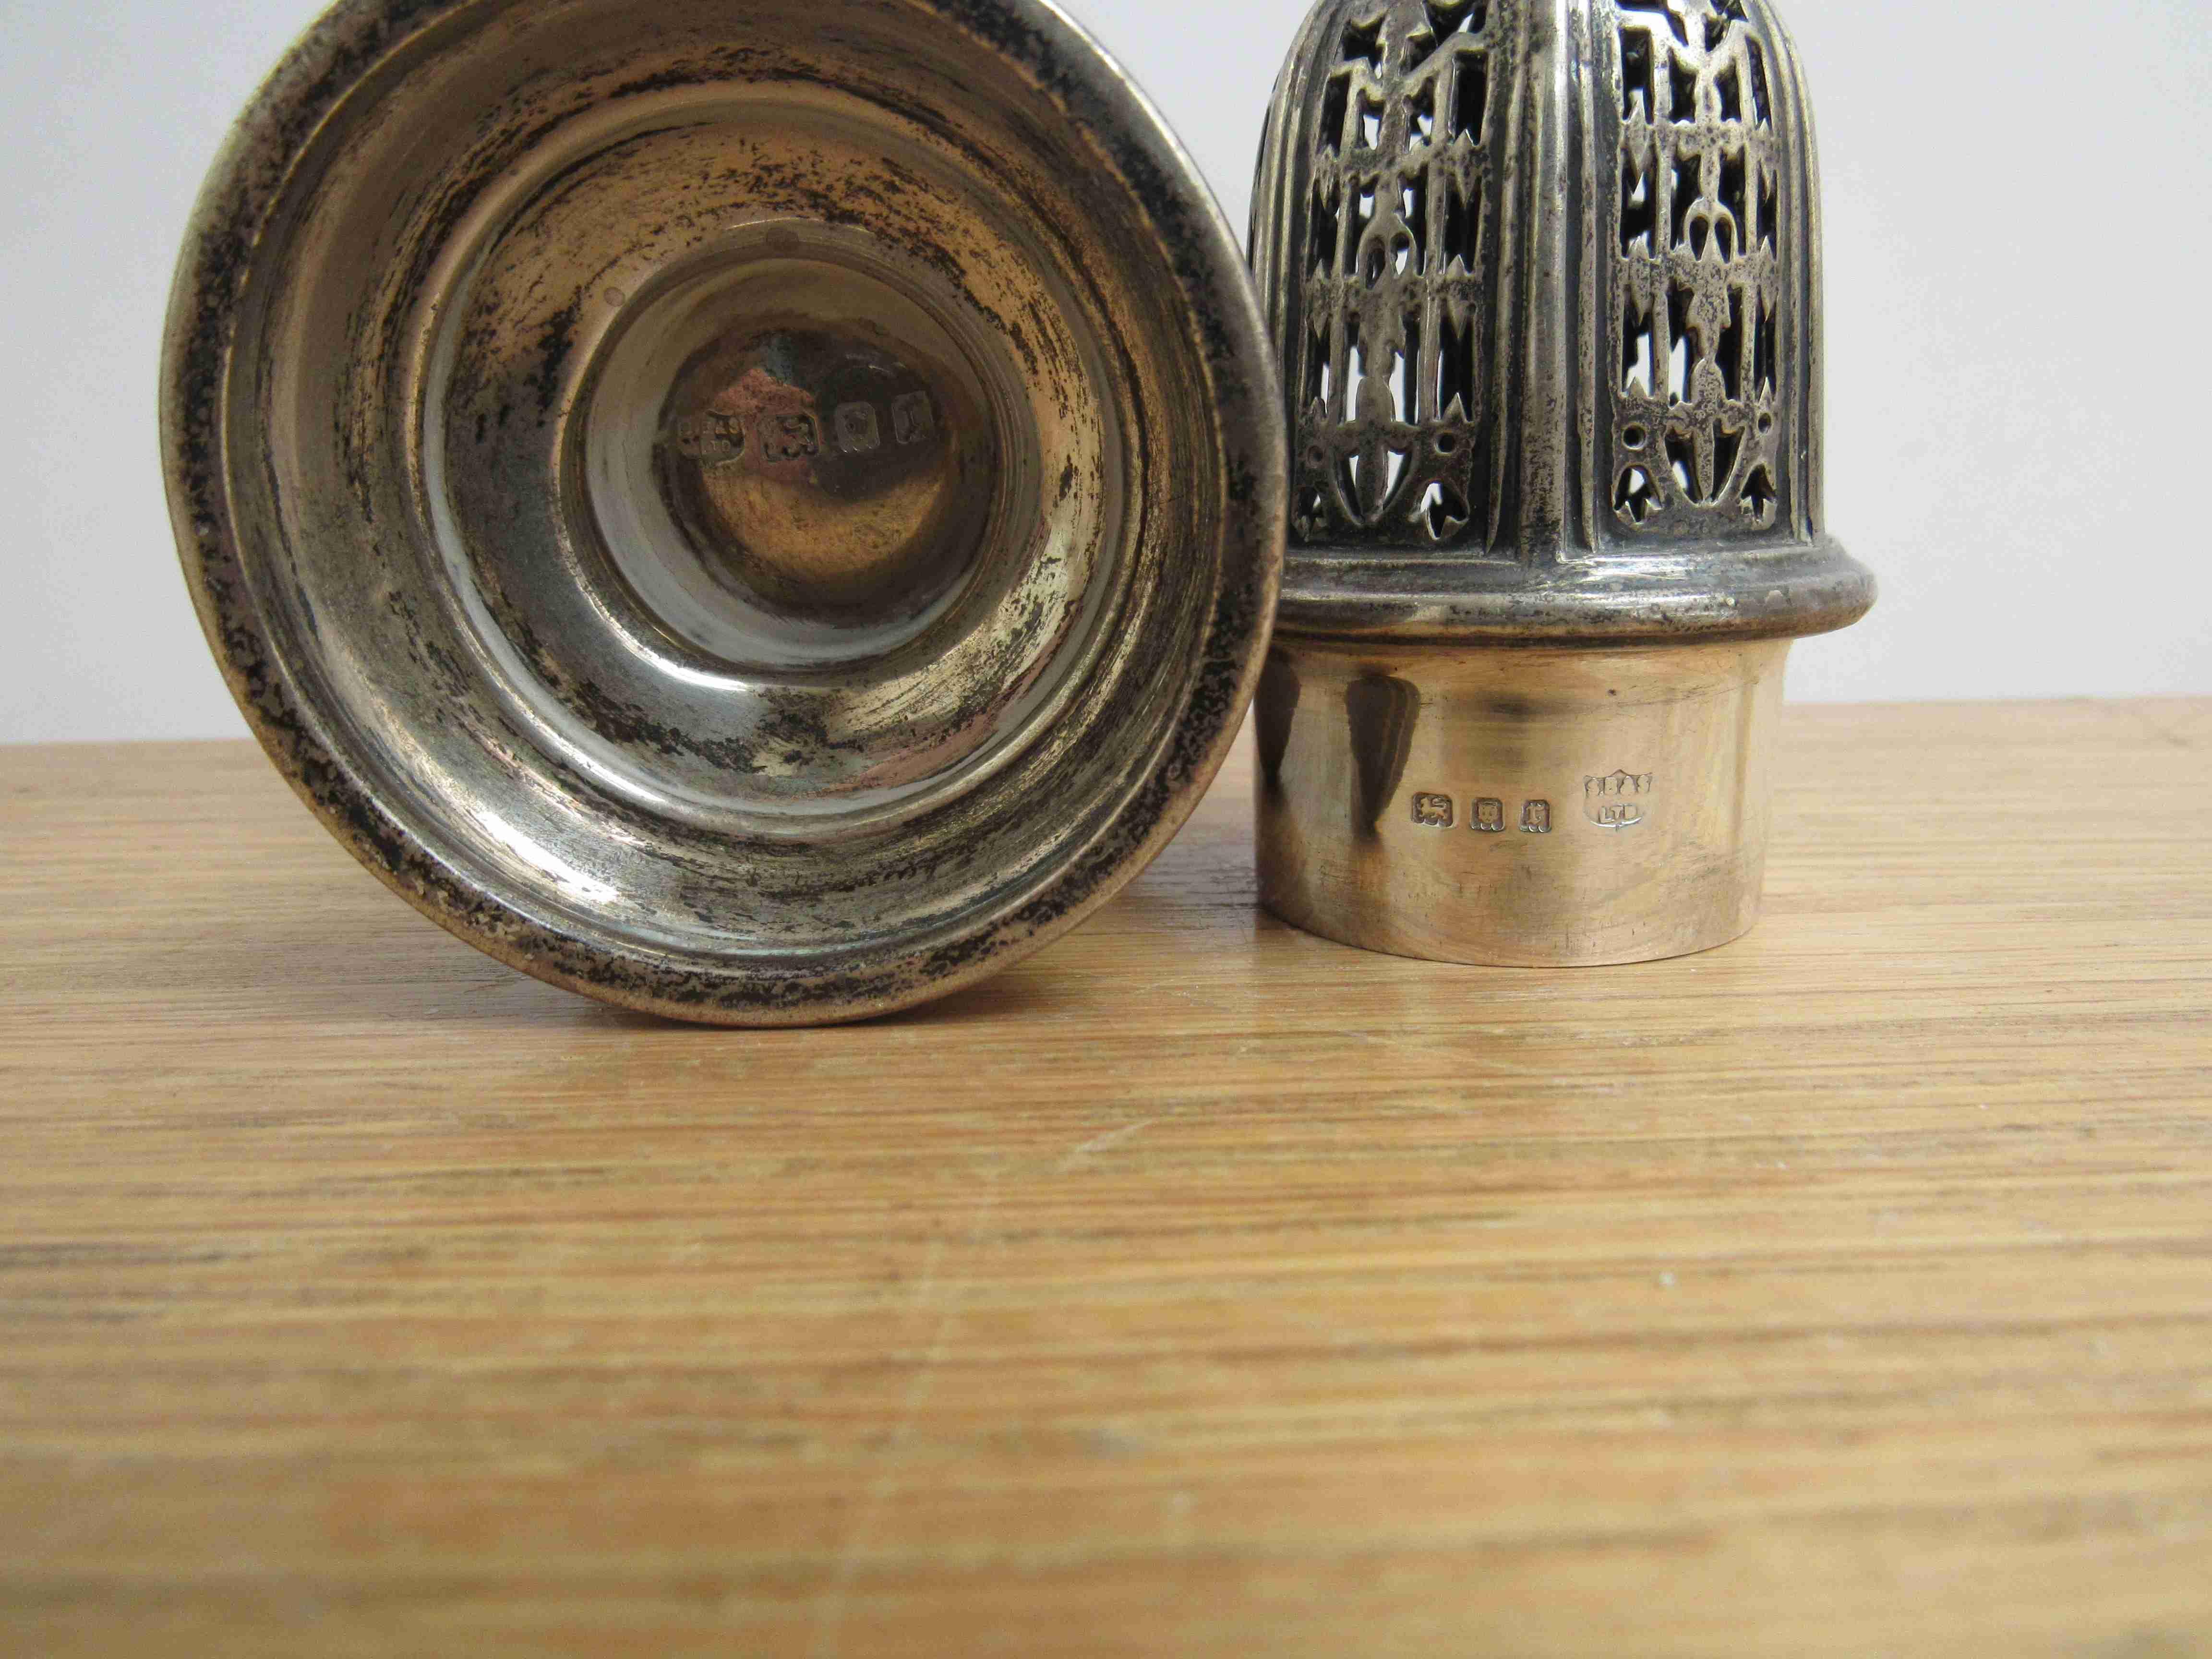 Lot 12 - A S Blanckensee and Sons Ltd silver sugar castor, London 1932, 18cm tall,